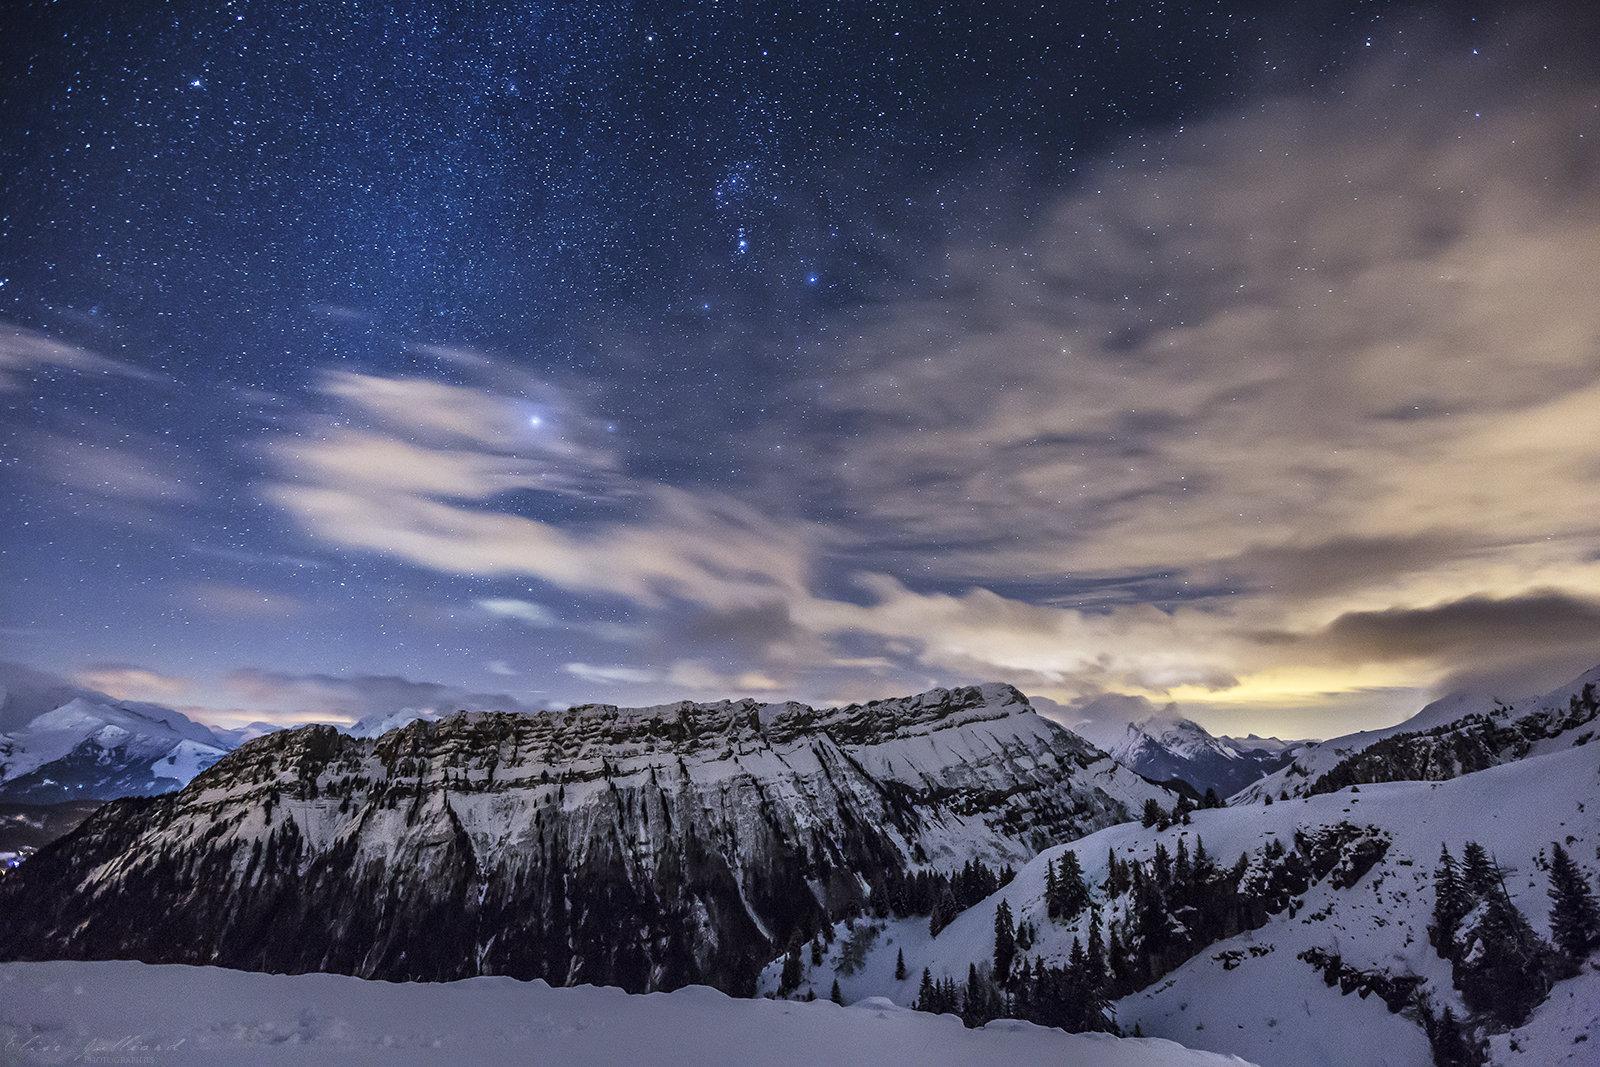 elise-julliard-photographe-photo-paysage-nuit-aravis-massif-des-bornes-haute-savoie